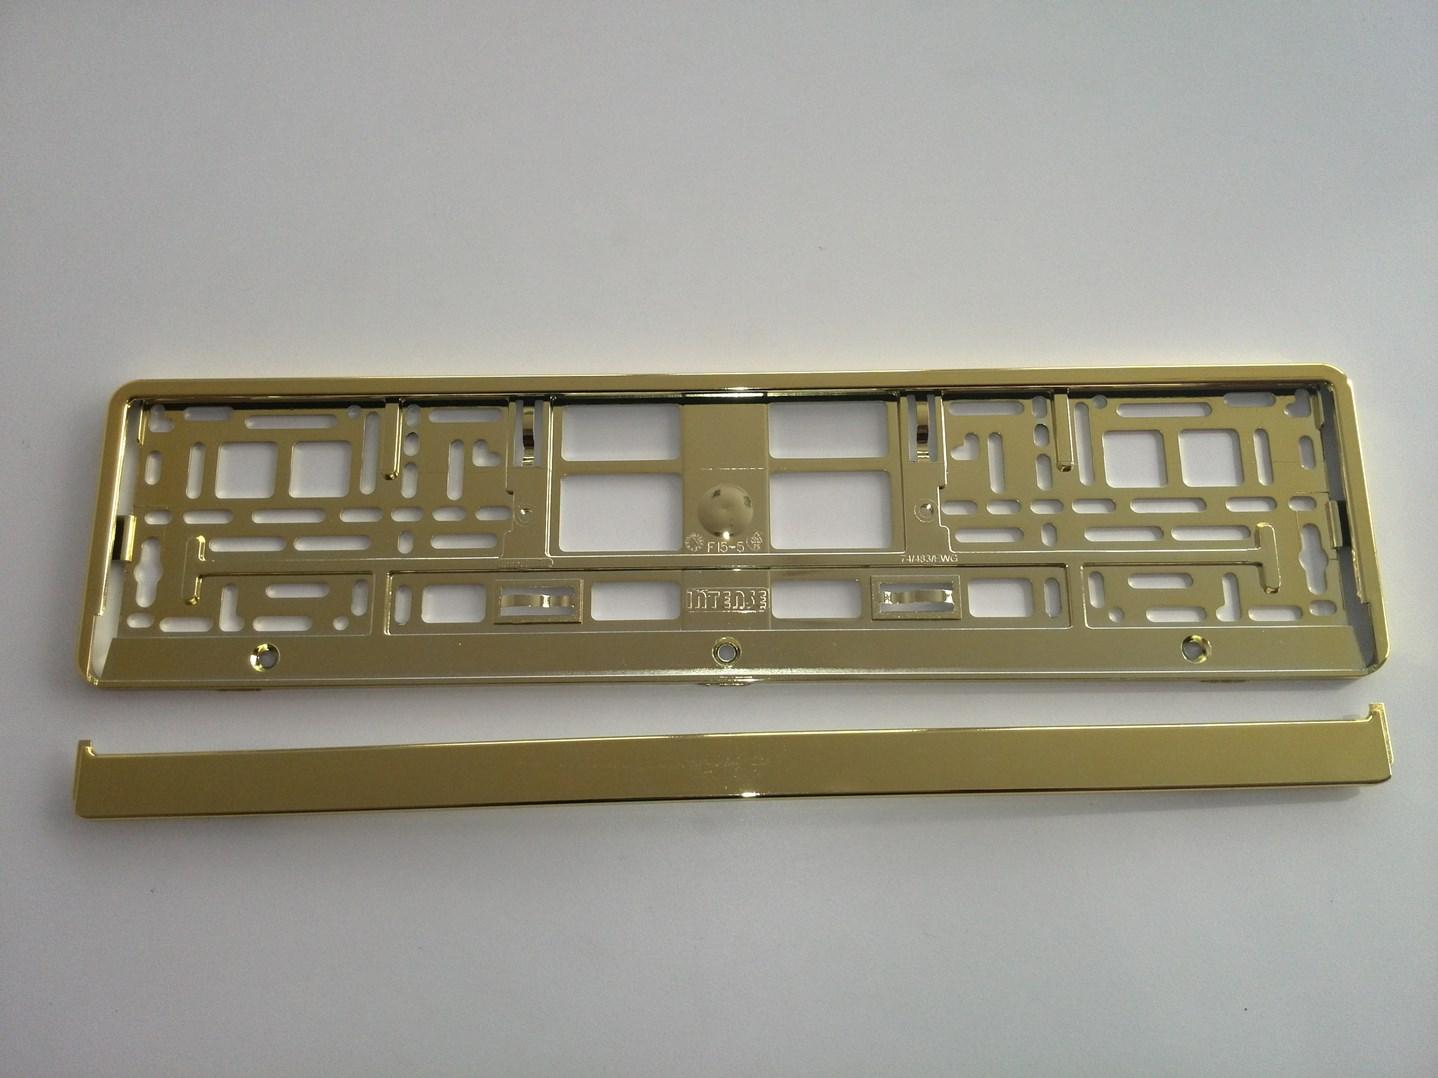 podlozka-spz-zlata-.jpg